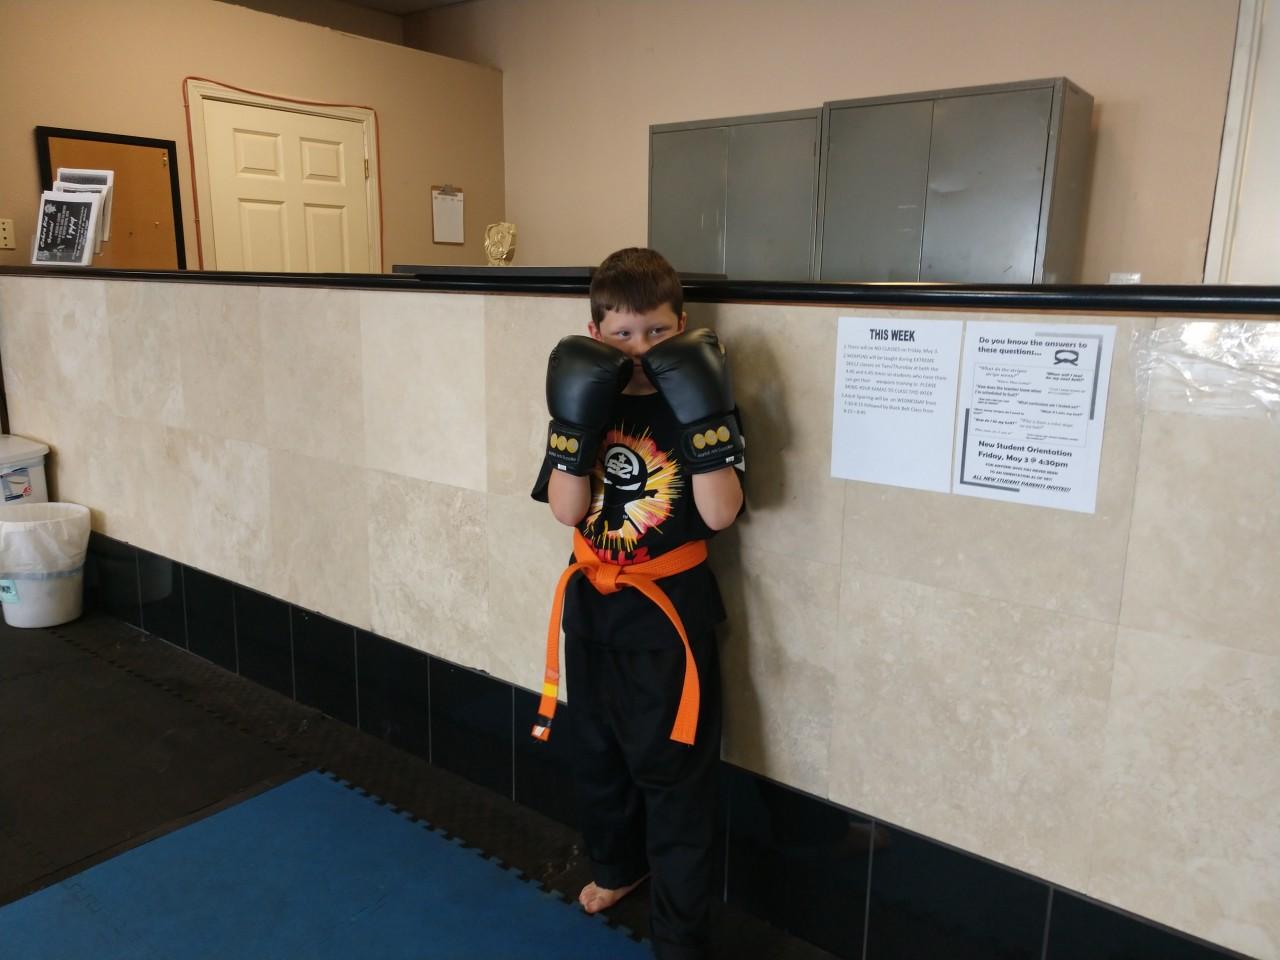 Martial arts student Owen Smith. Photo by Carmel de Bertaut.